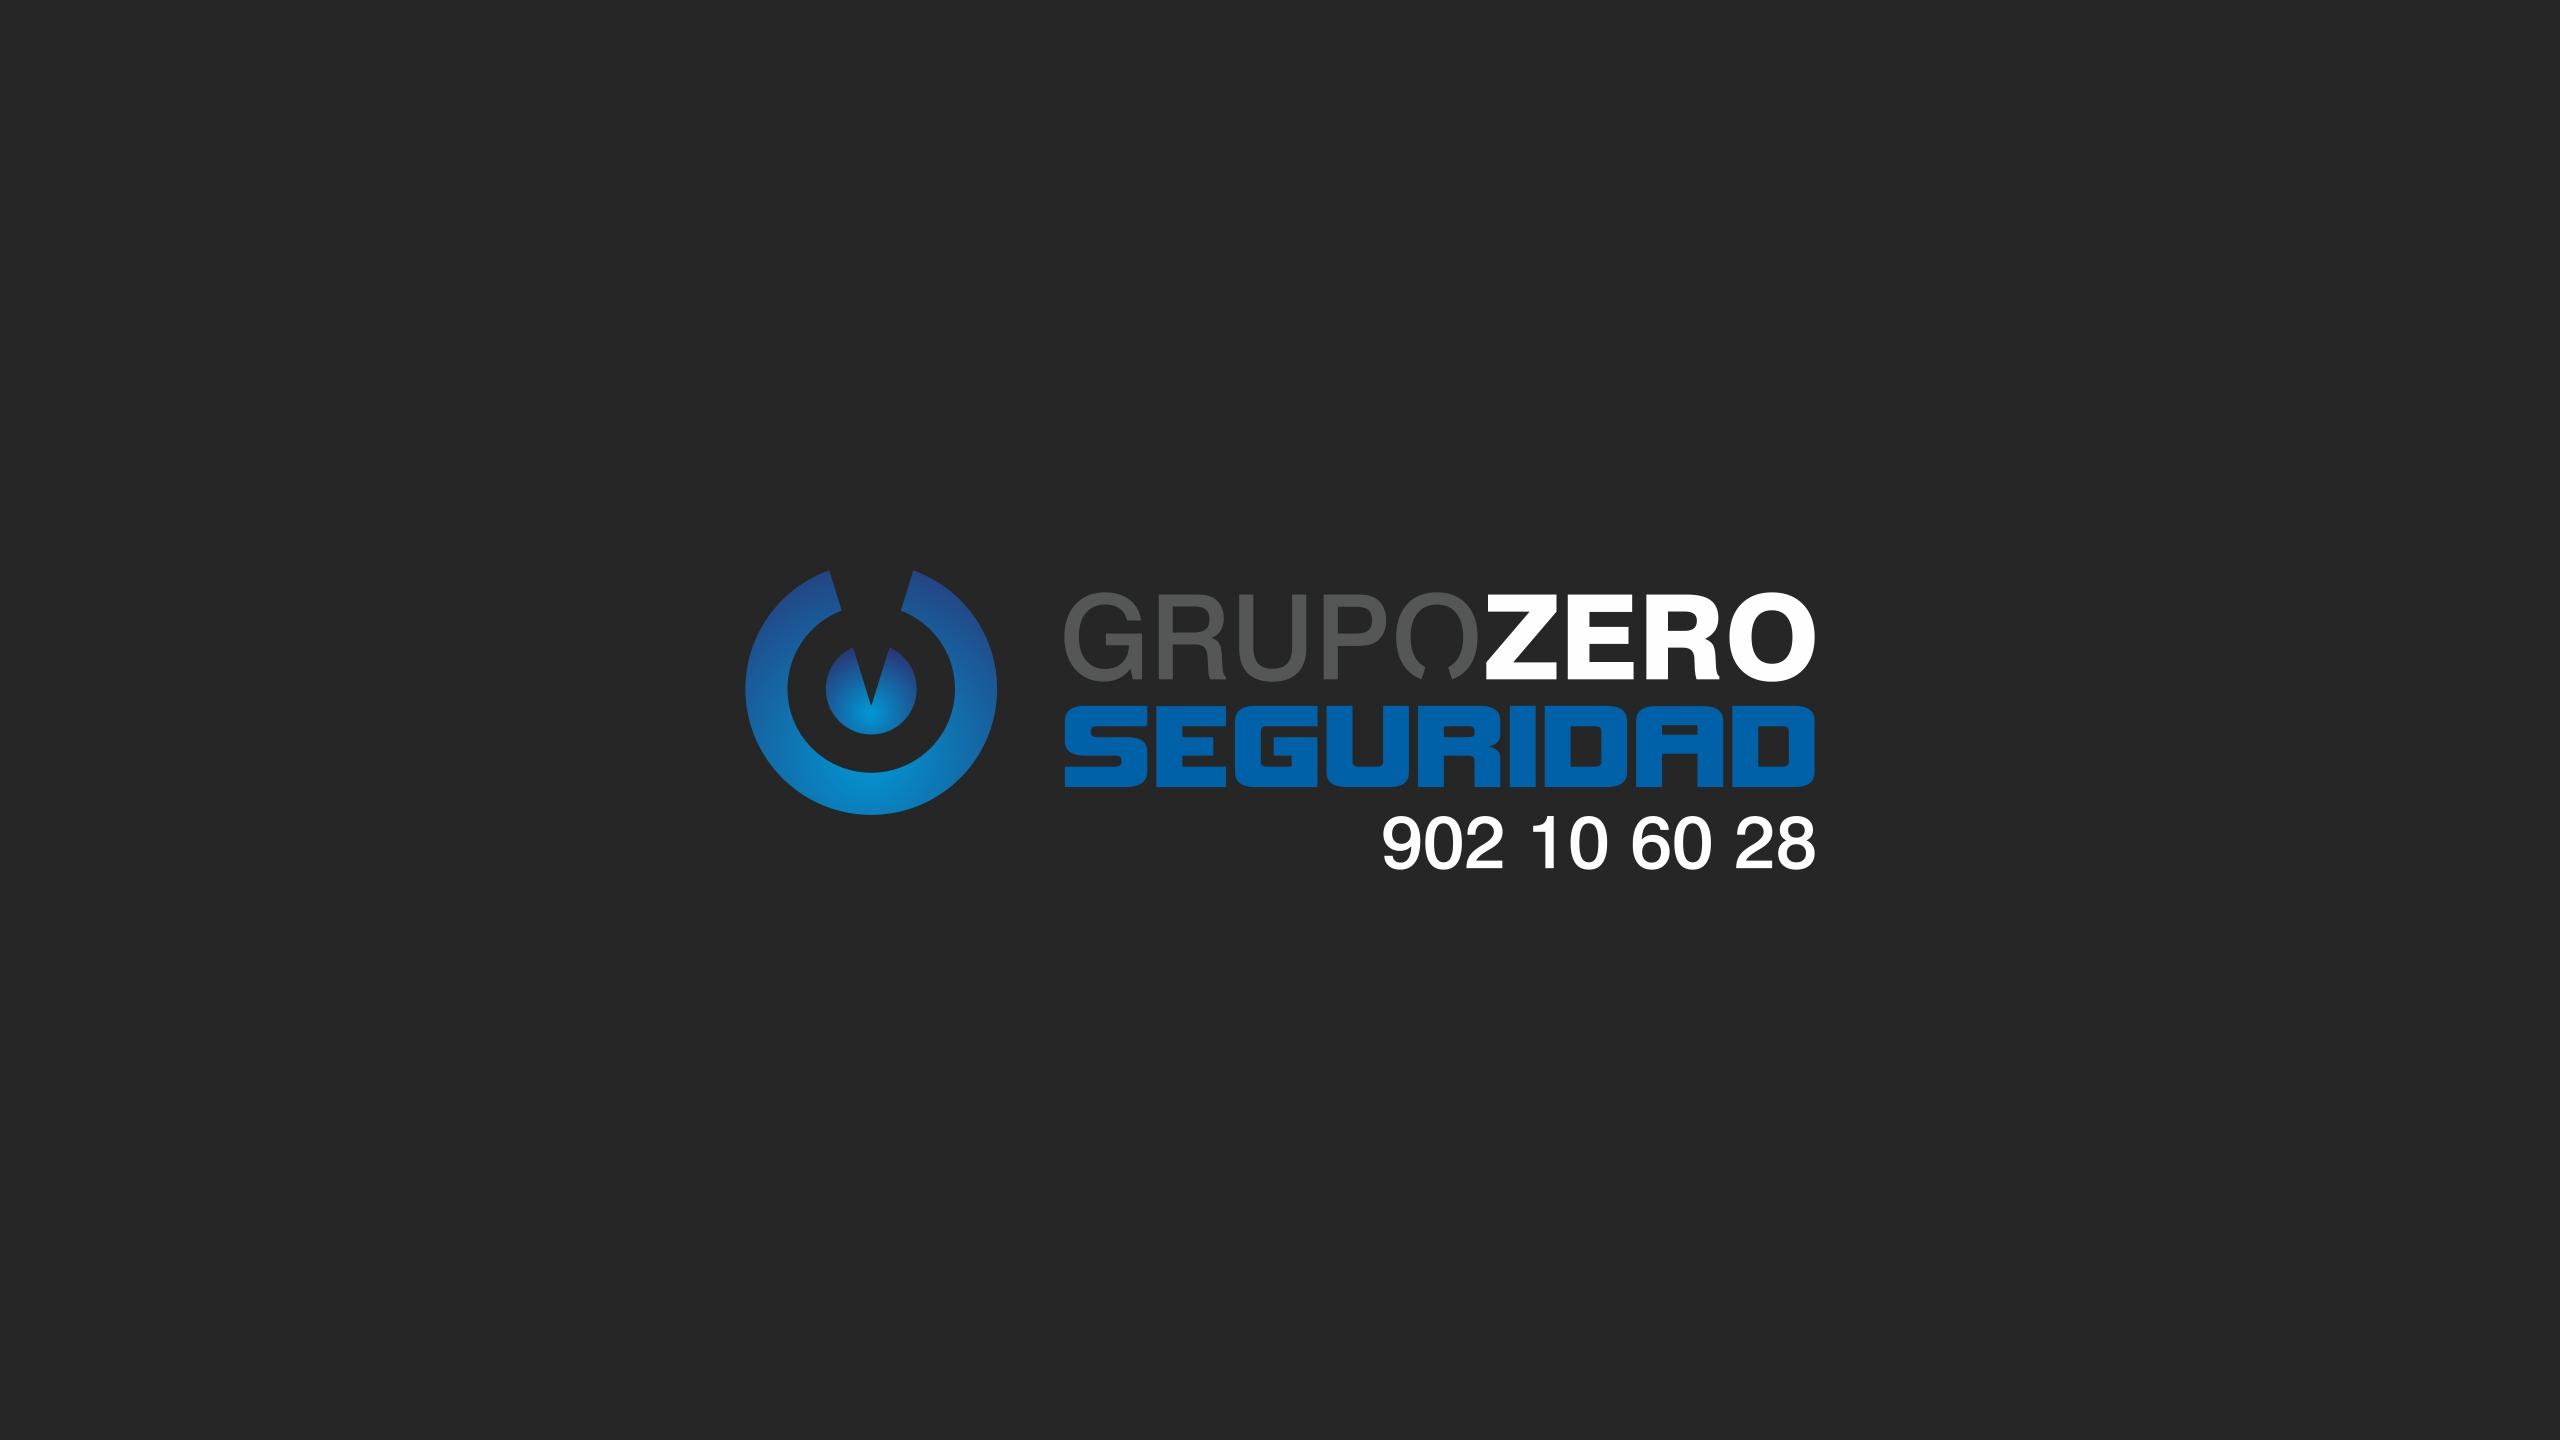 Diseño grupo zero diseño logotipo